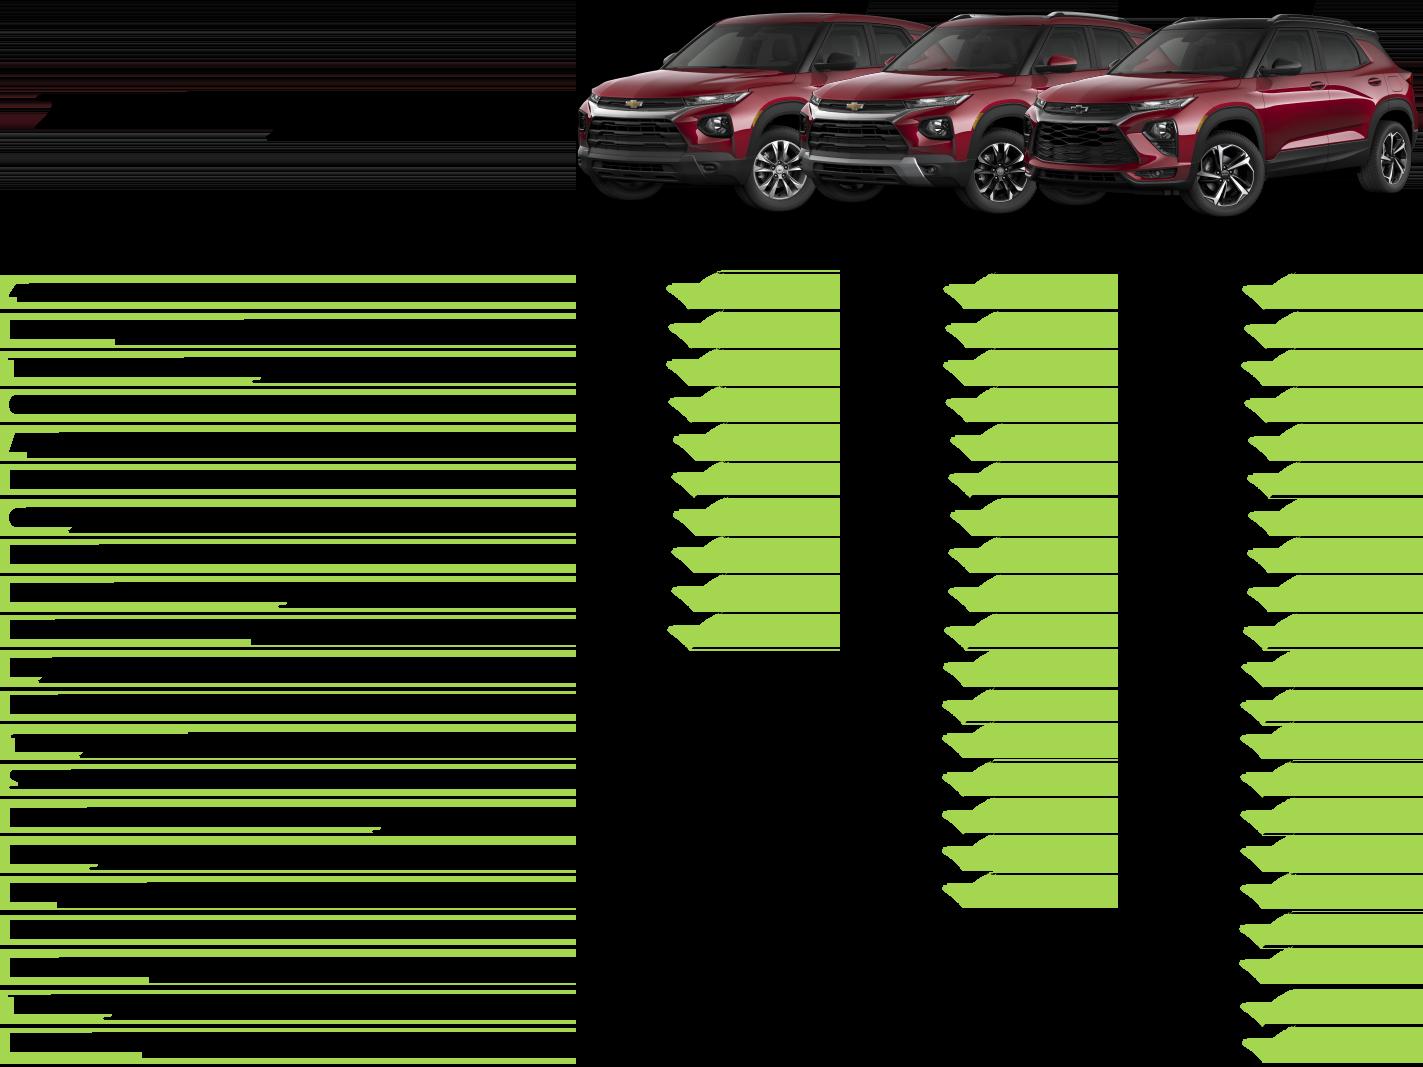 Trailblazer trim level comparison